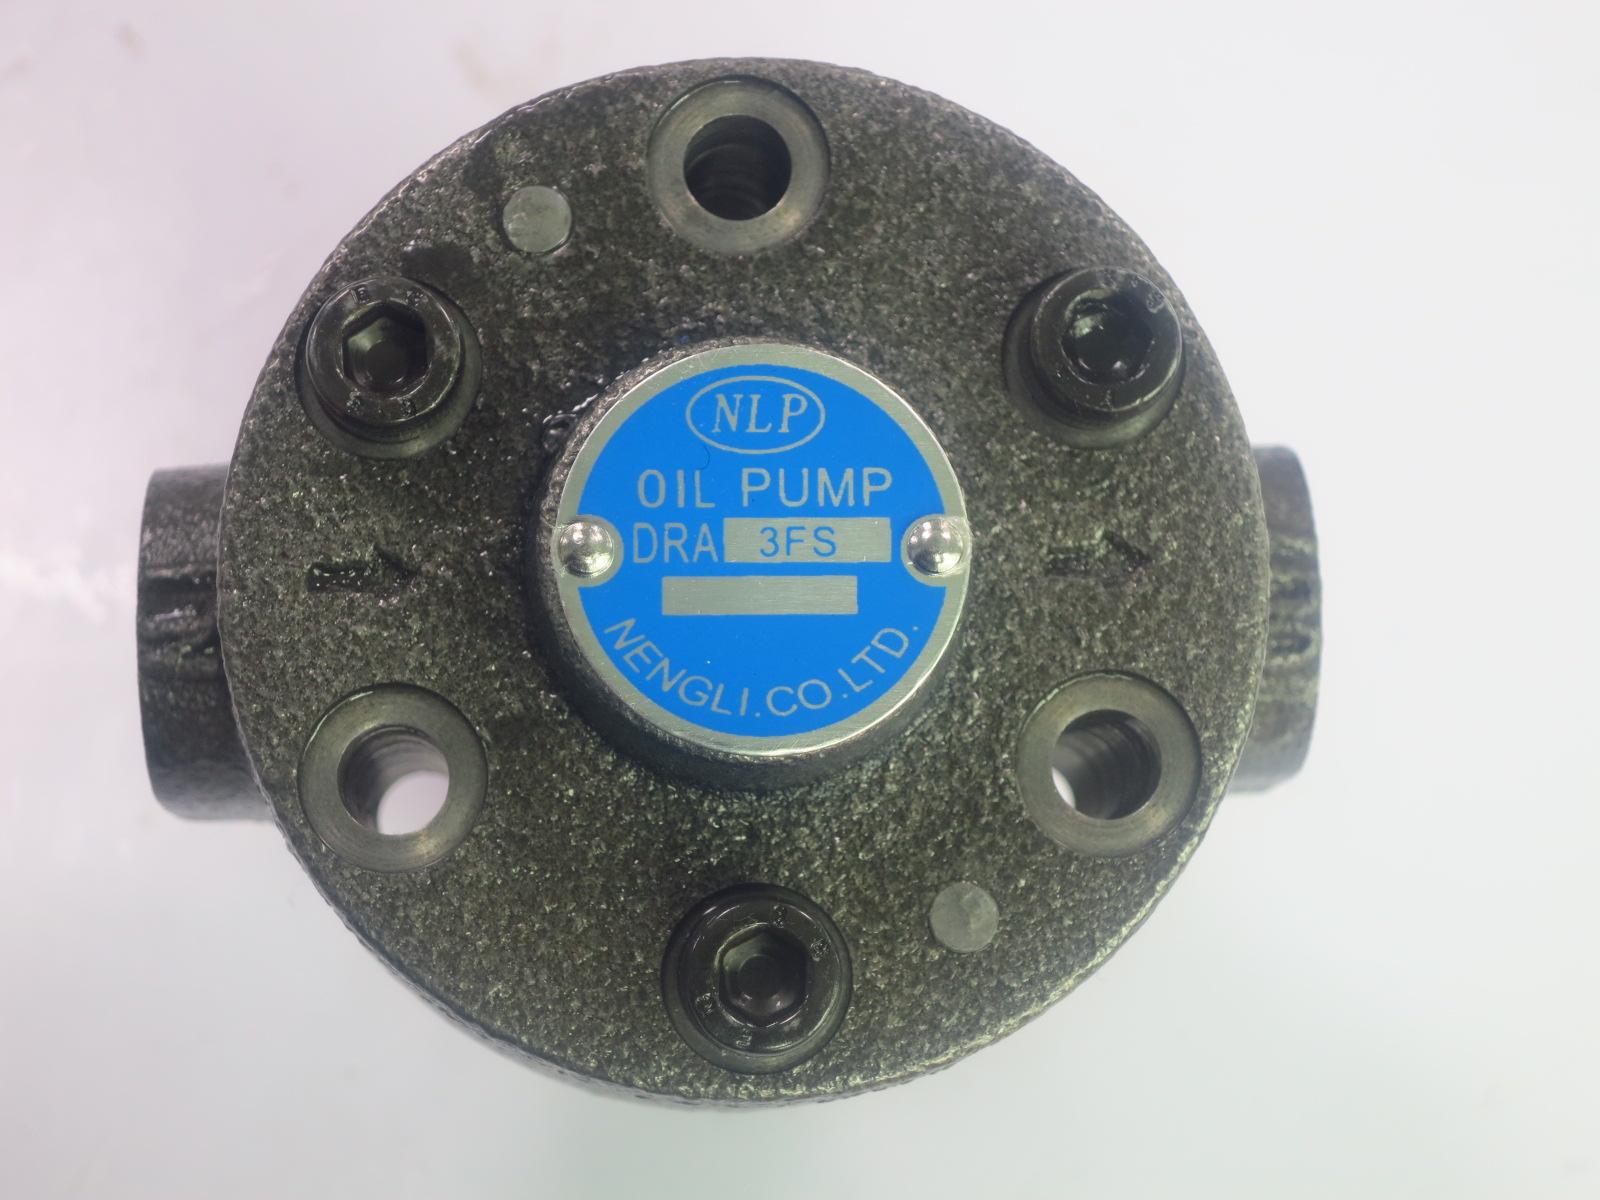 双向泵3FS-DRA3FS